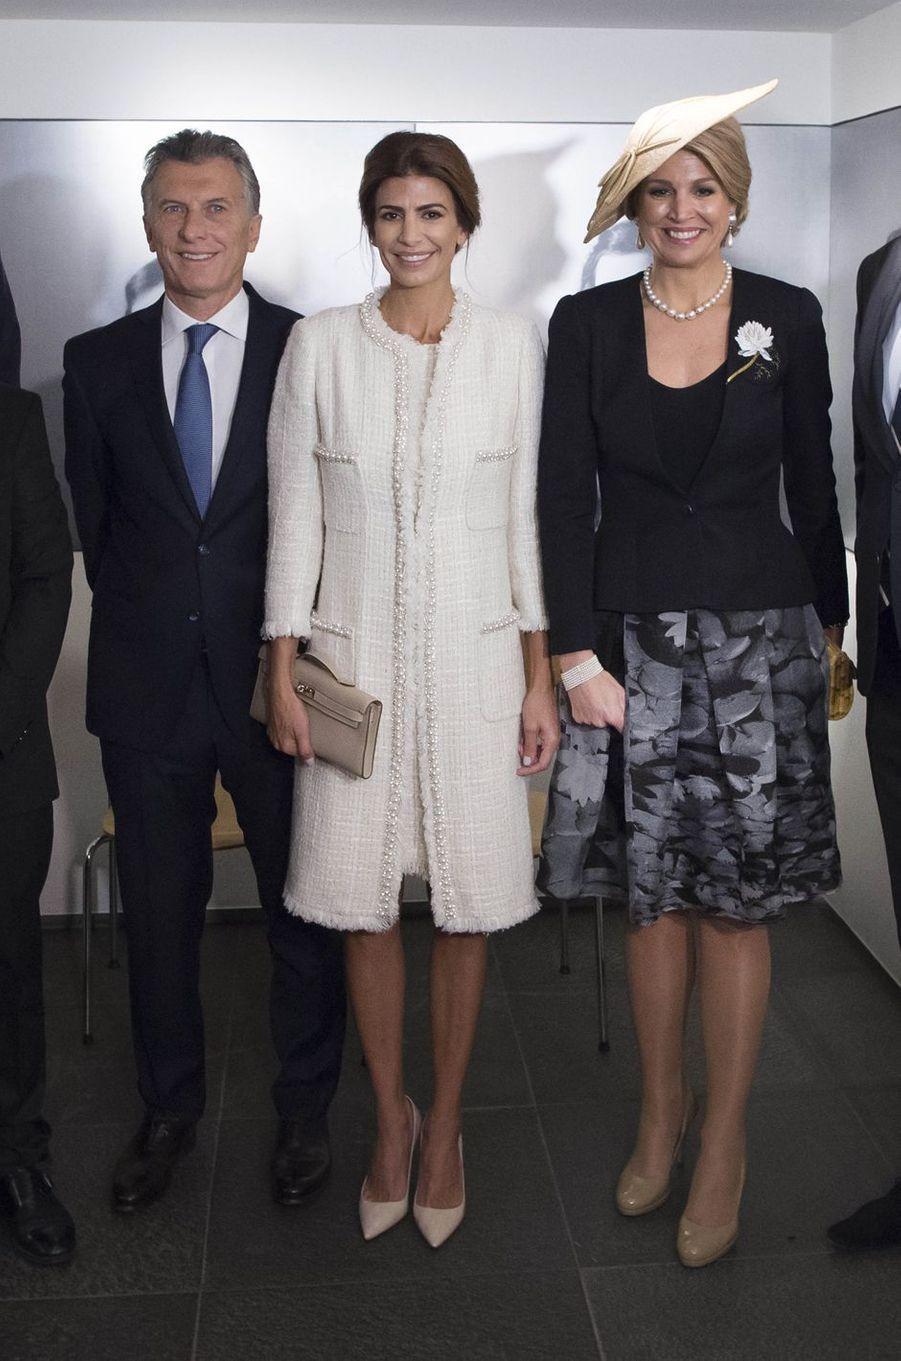 La reine Maxima des Pays-Bas avec Mauricio Macri et Juliana Awada à Amsterdam, le 27 mars 2017